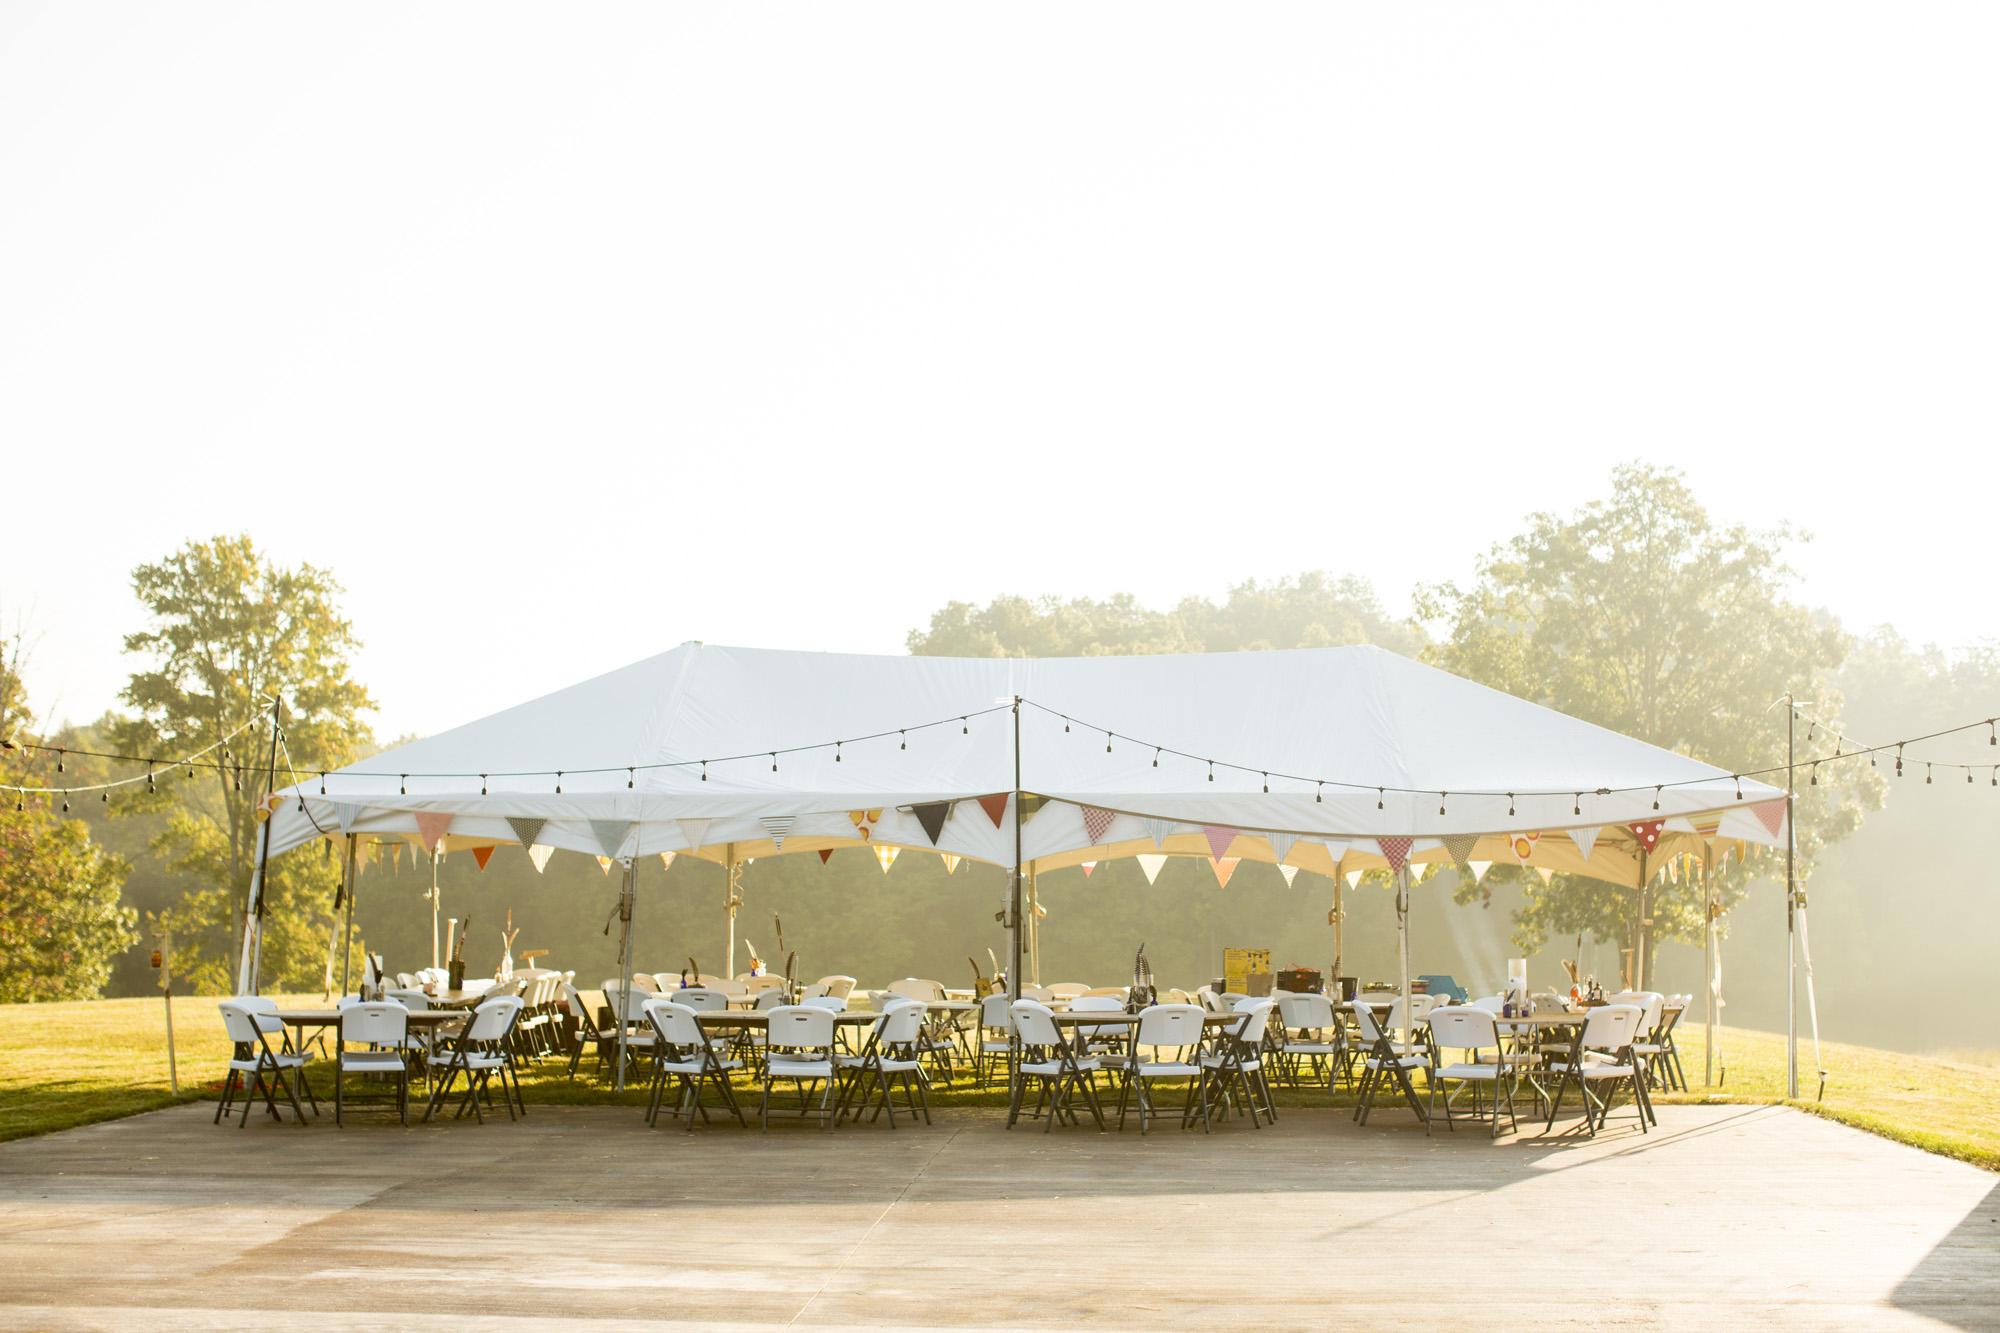 Seriously_Sabrina_Photography_Red_River_Gorge_Kentucky_Wedding_ShawnDana173.jpg